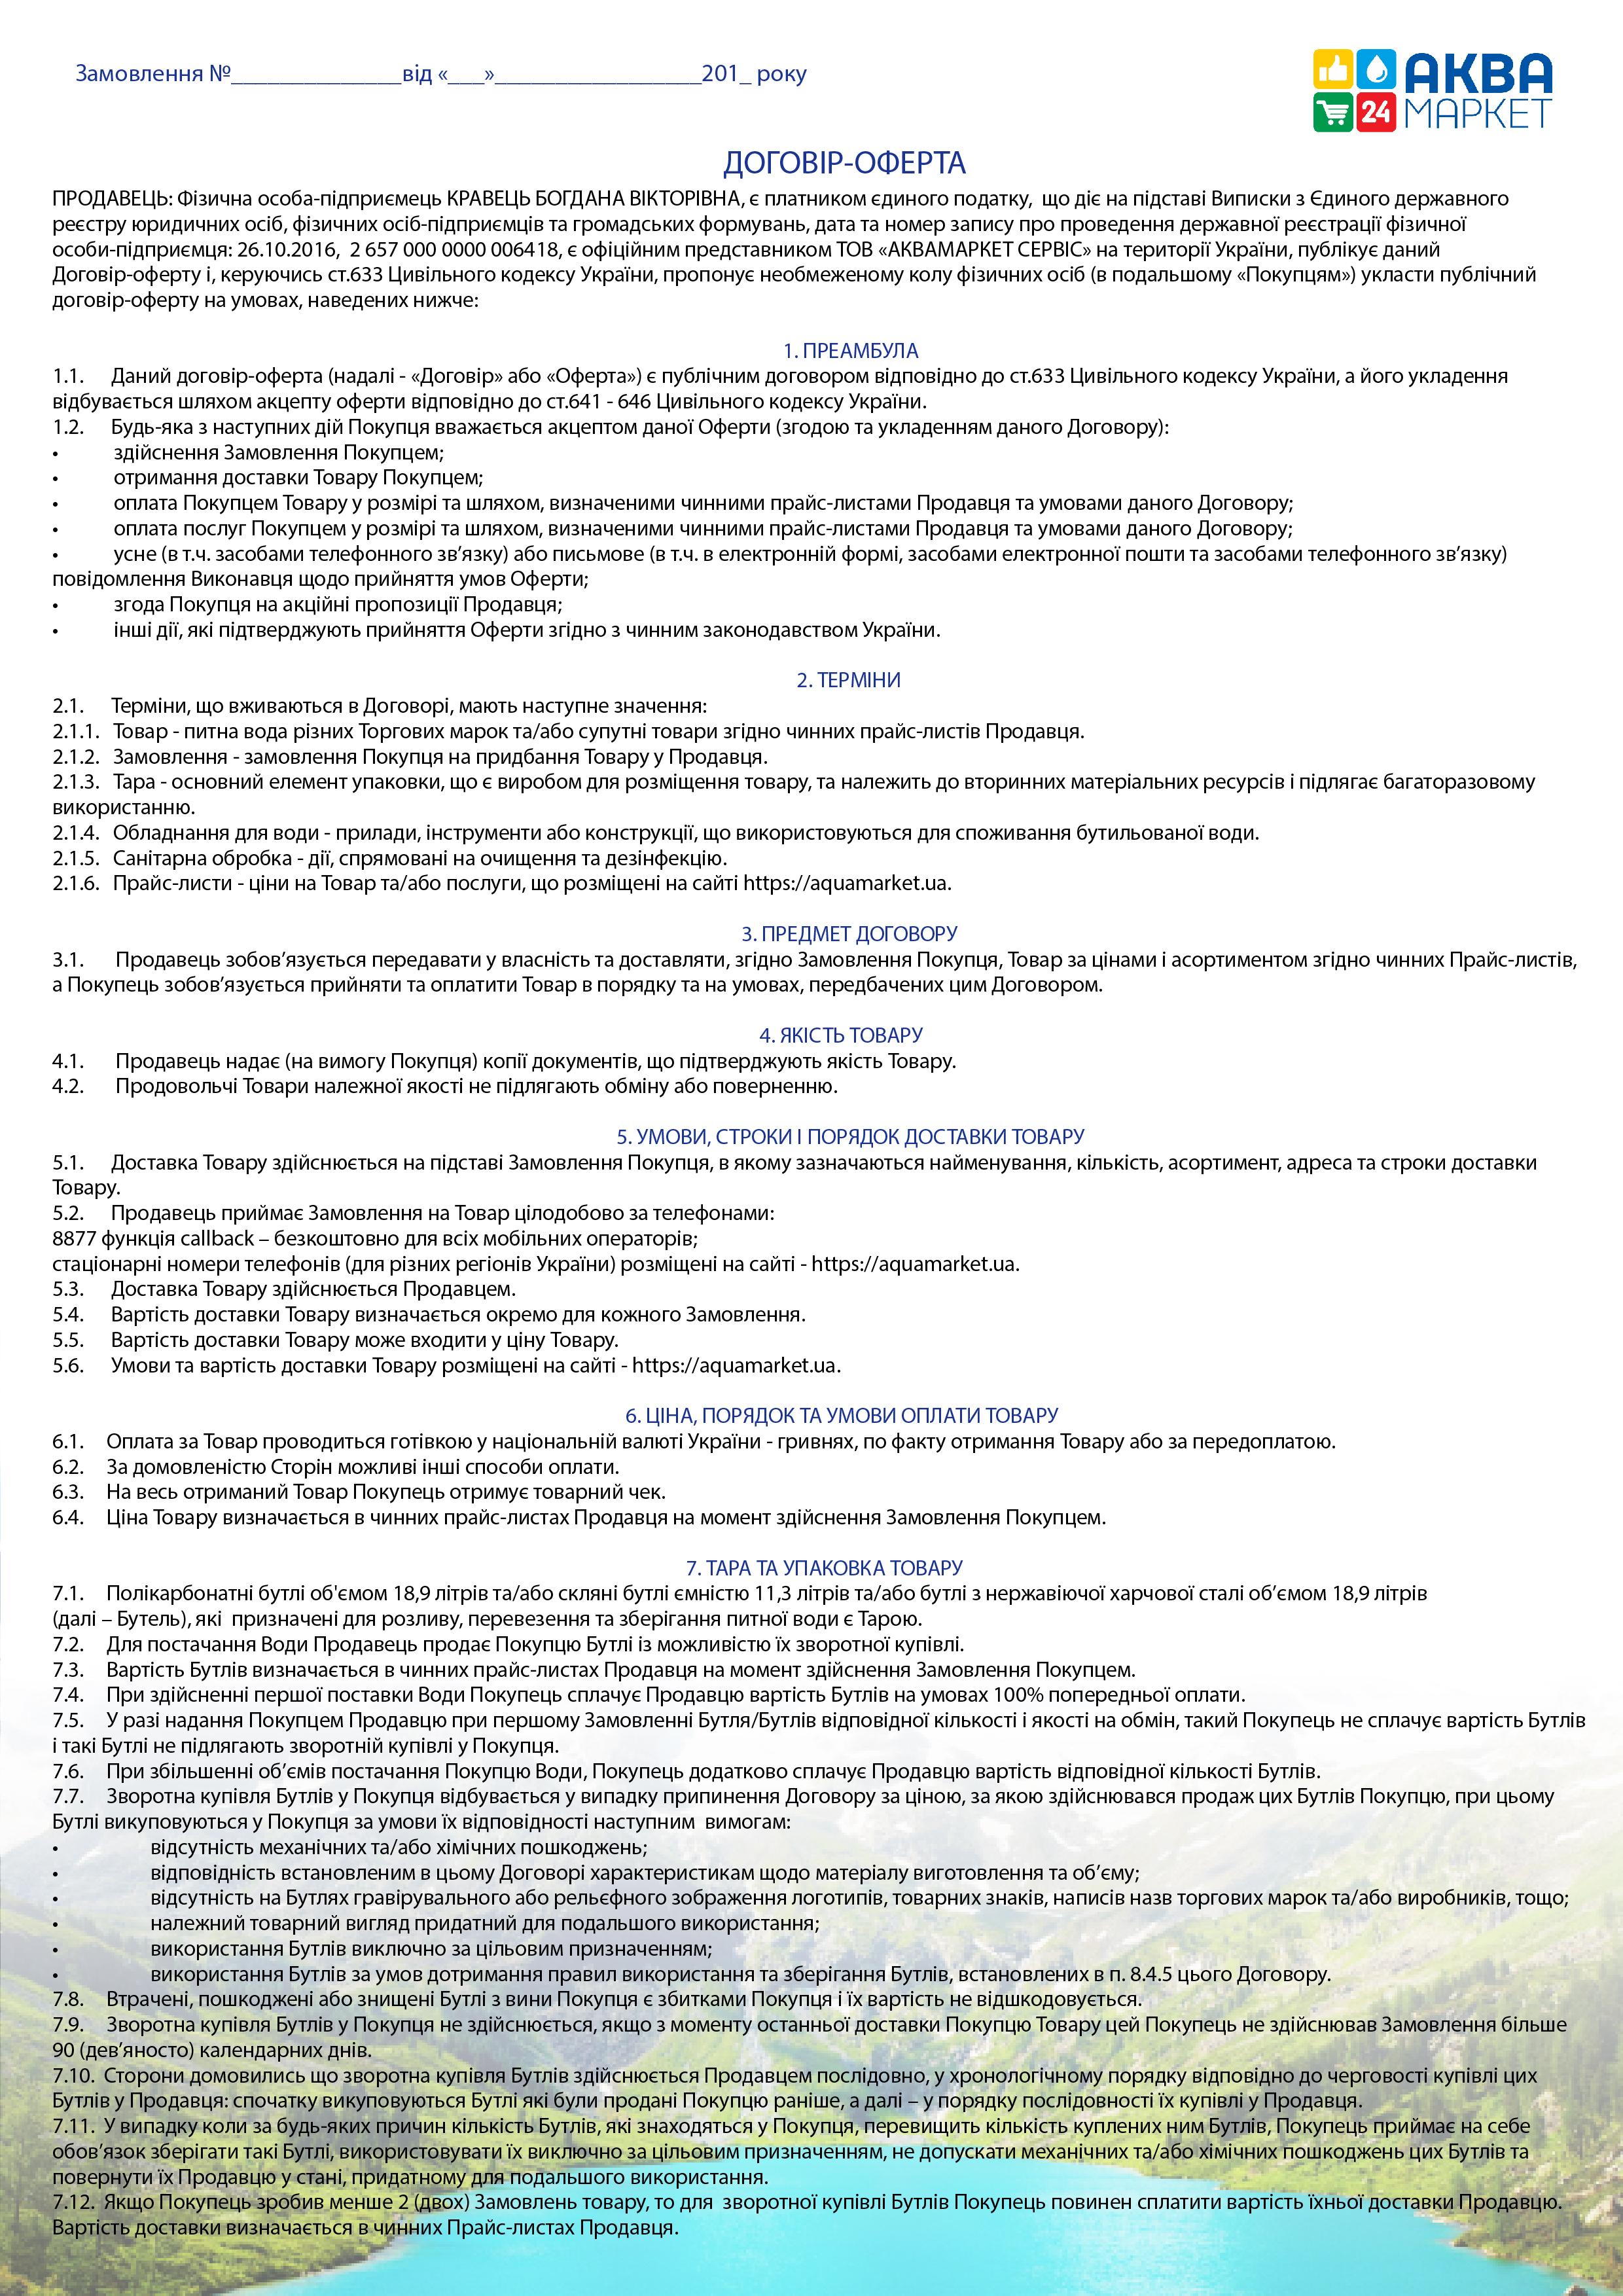 ac4582c5f8903 Договор-оферта - АкваМаркет